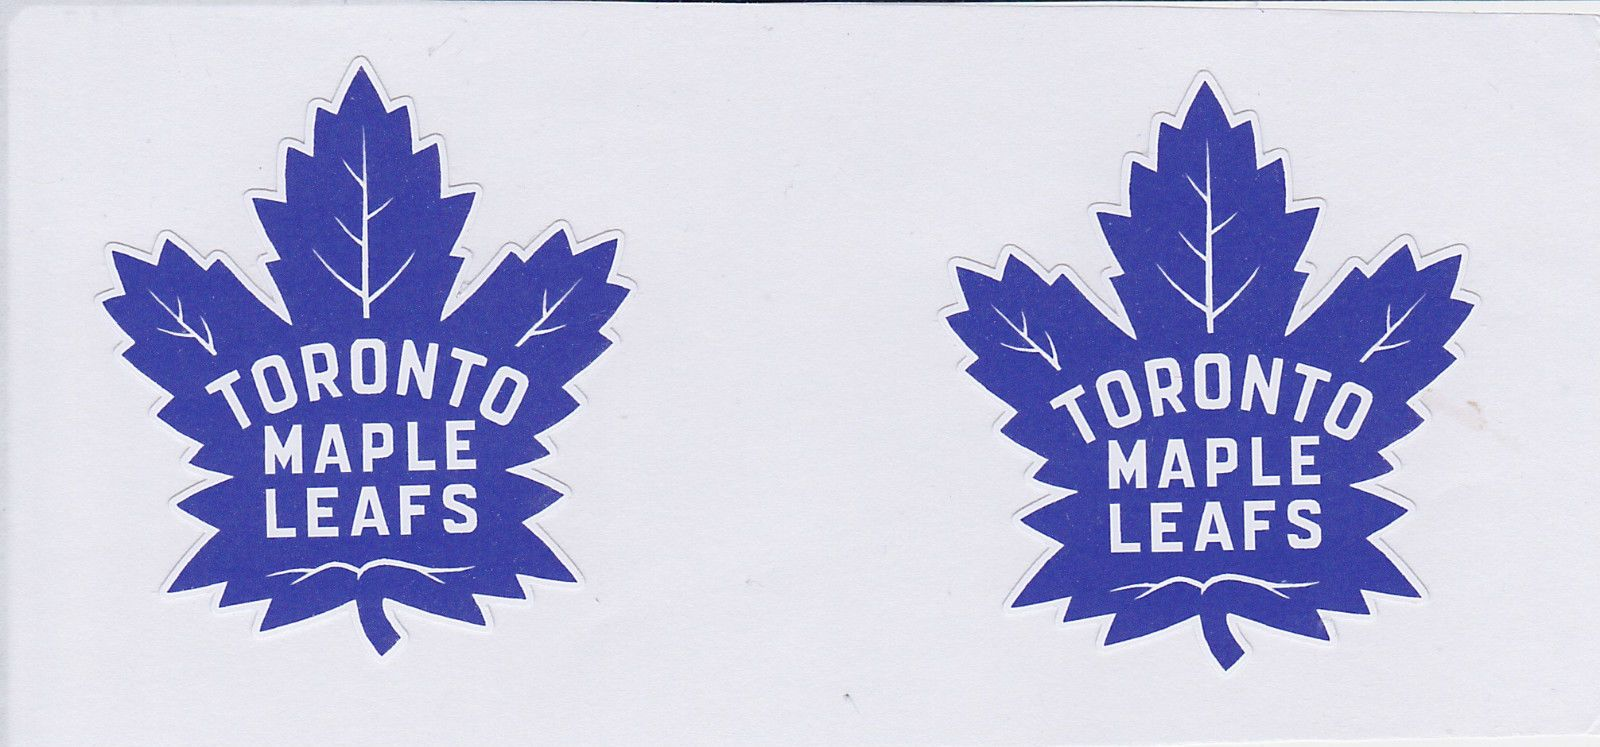 2 X Toronto Maple Leafs Hi Gloss Stickers Toronto Maple Toronto Maple Leafs Maple Leafs